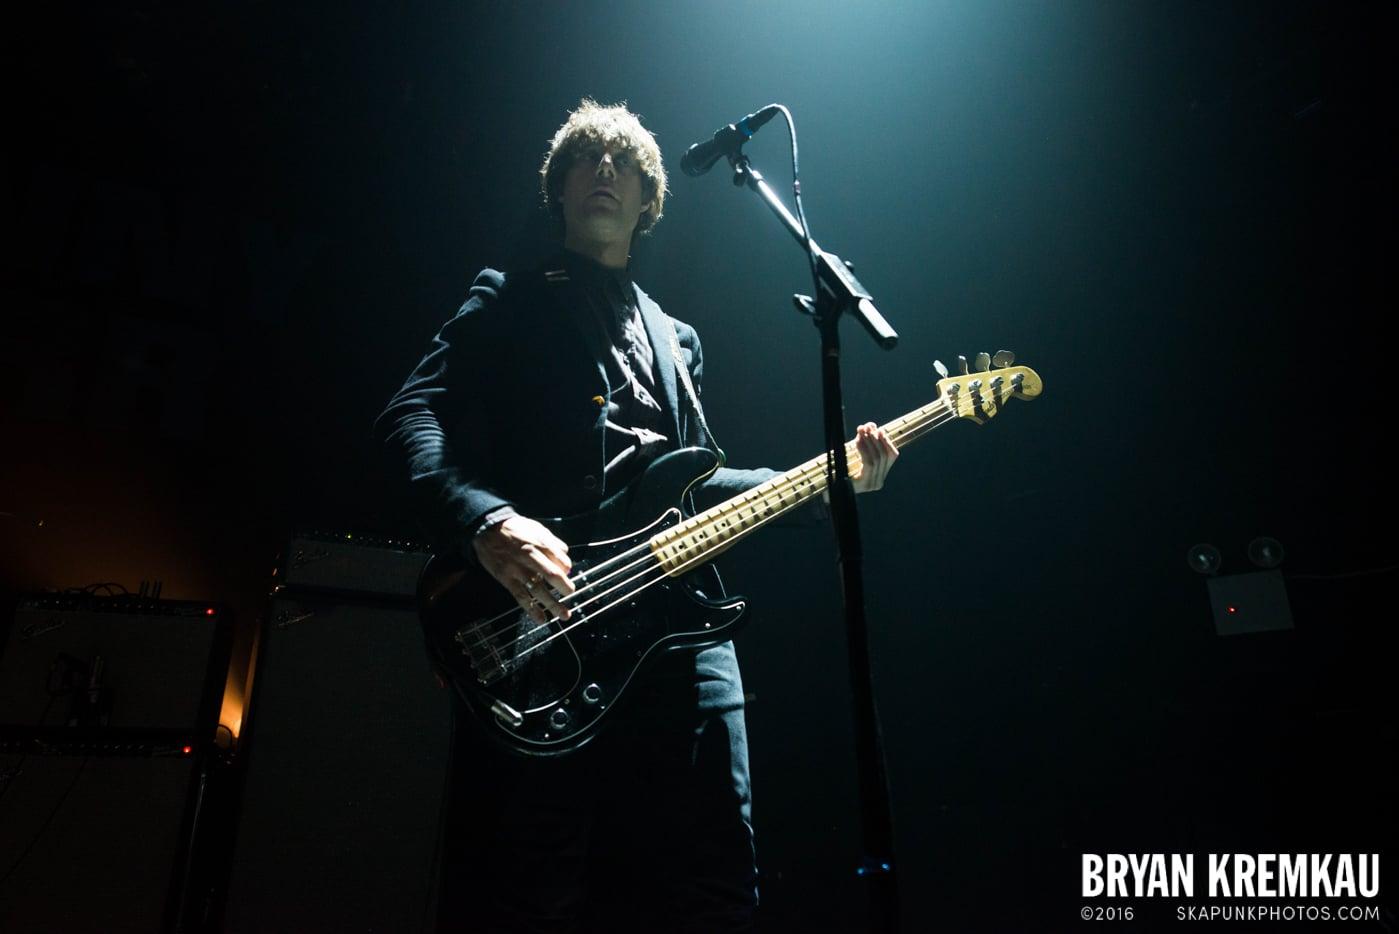 Johnny Marr @ Gramercy Theatre, NYC - 11.12.14 (13)